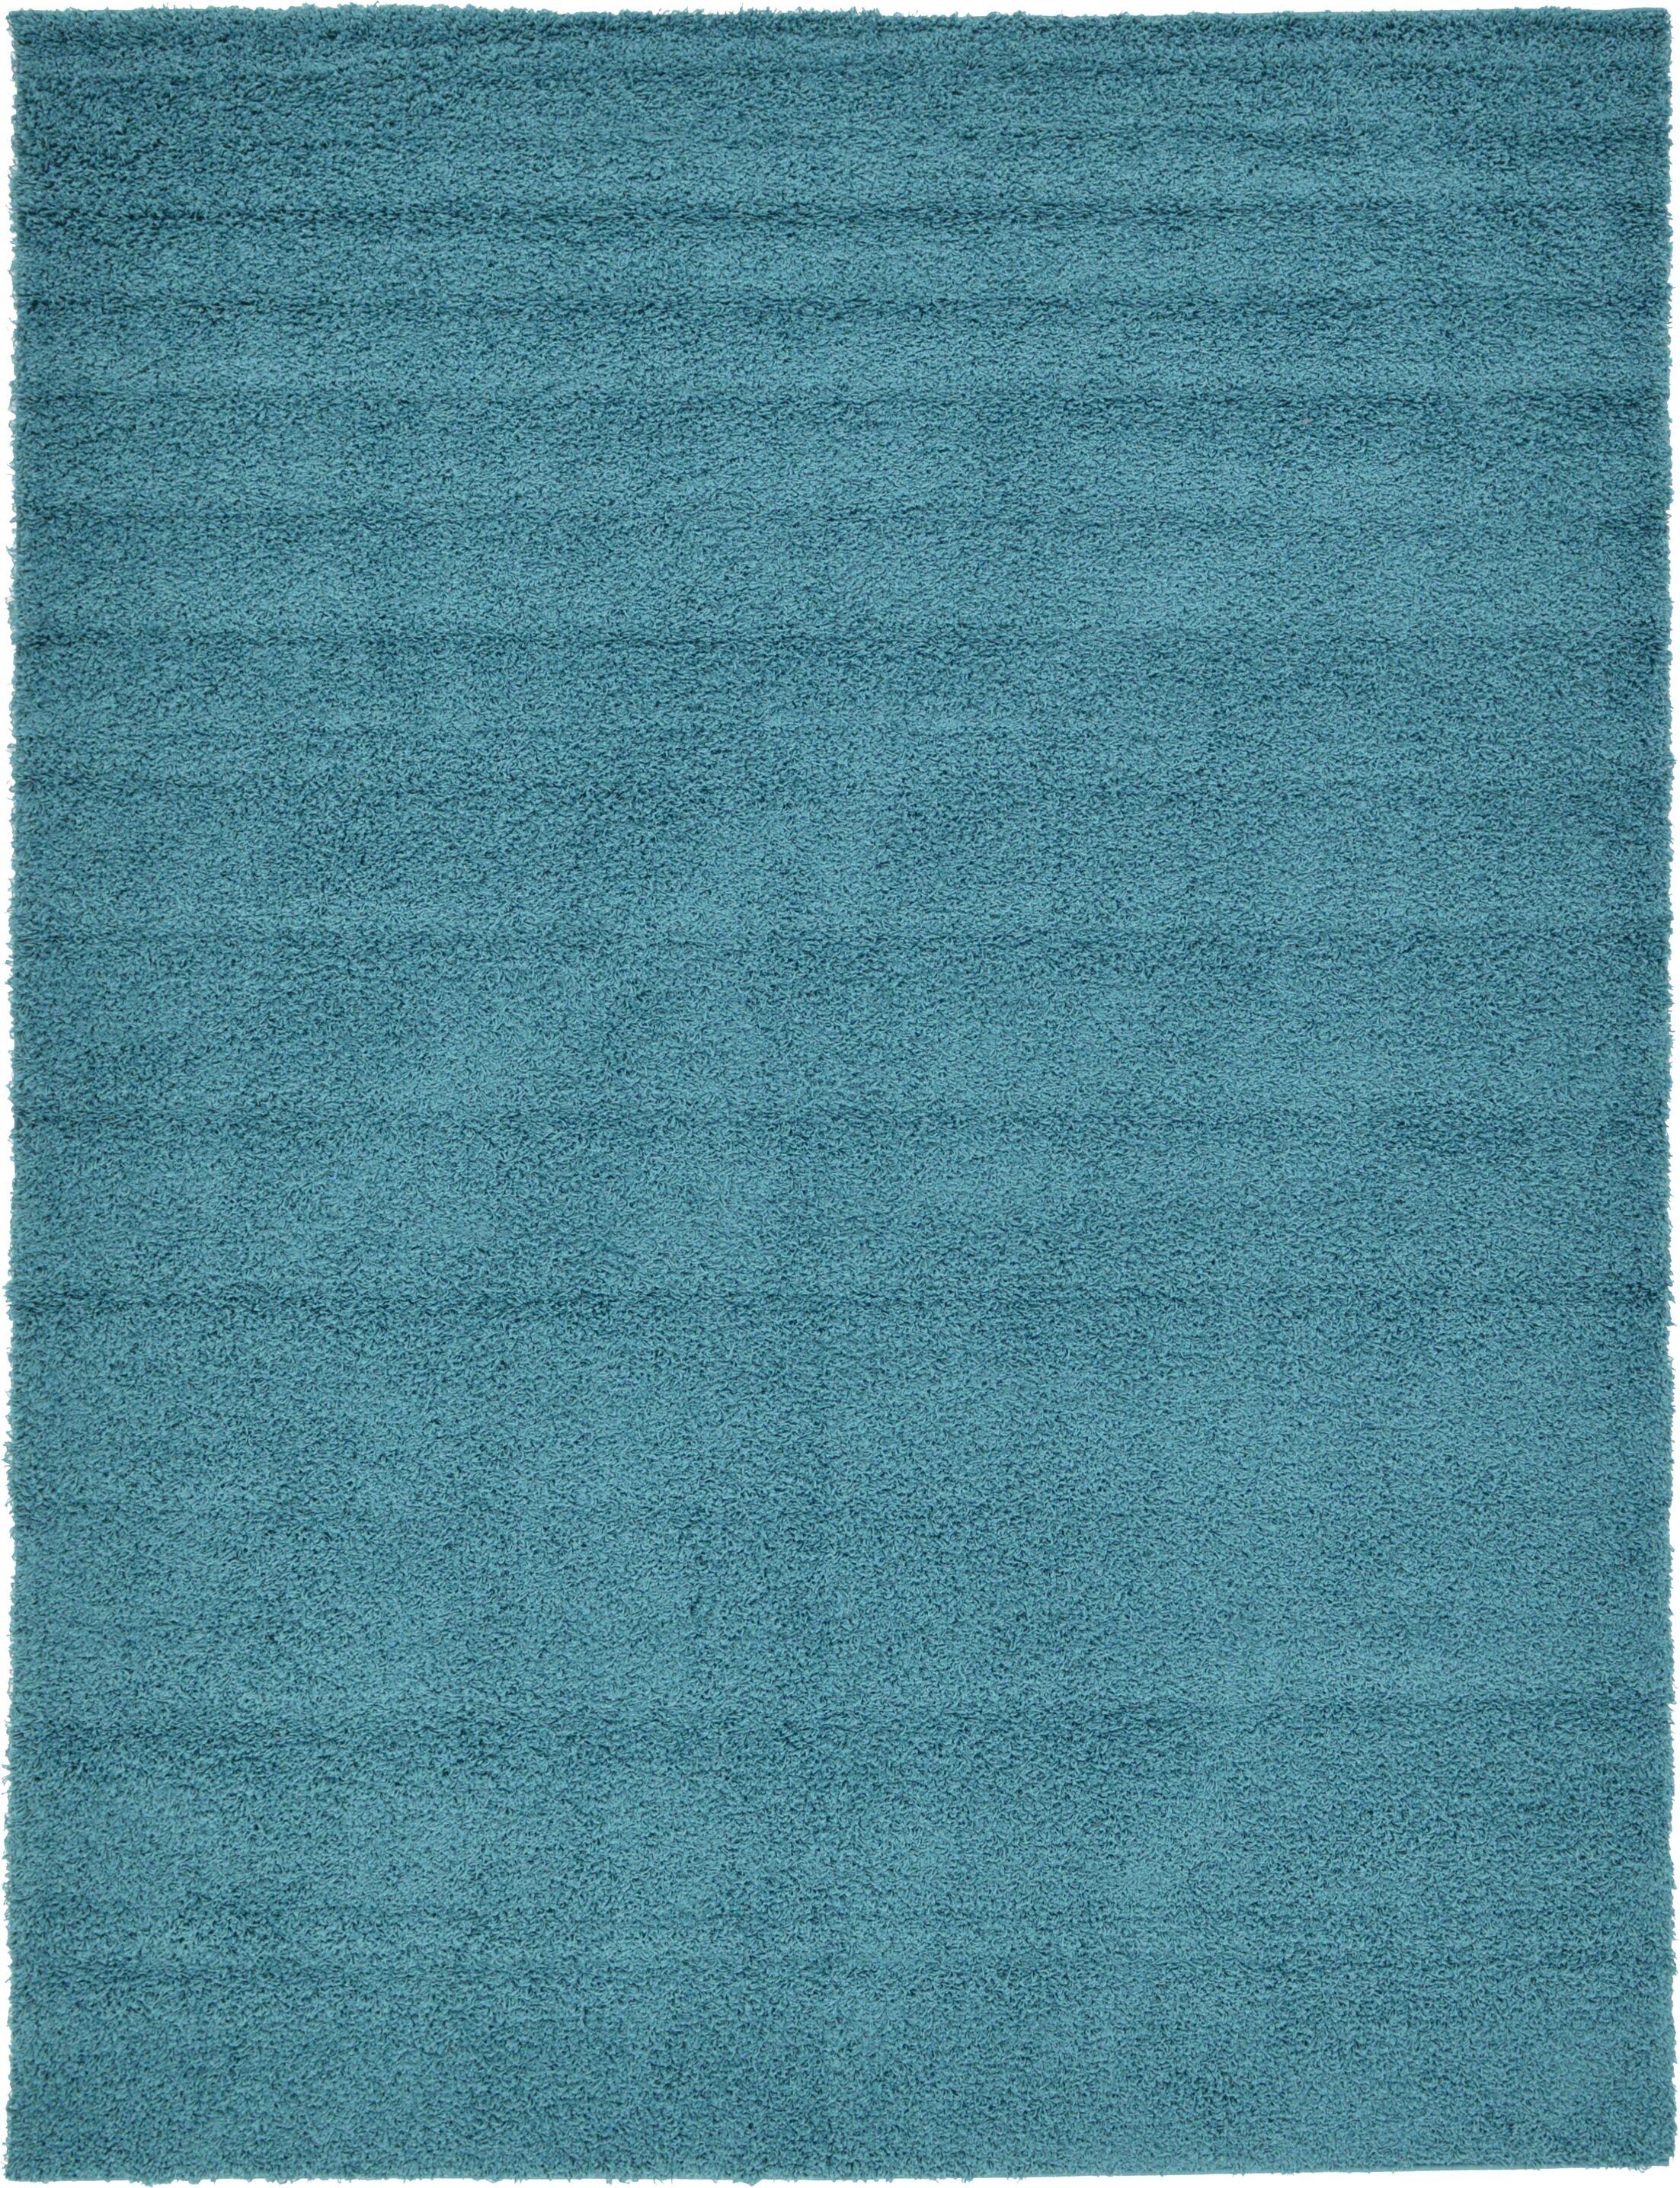 Lilah Teal Blue Area Rug Rug Size: Rectangle 9' x 12'